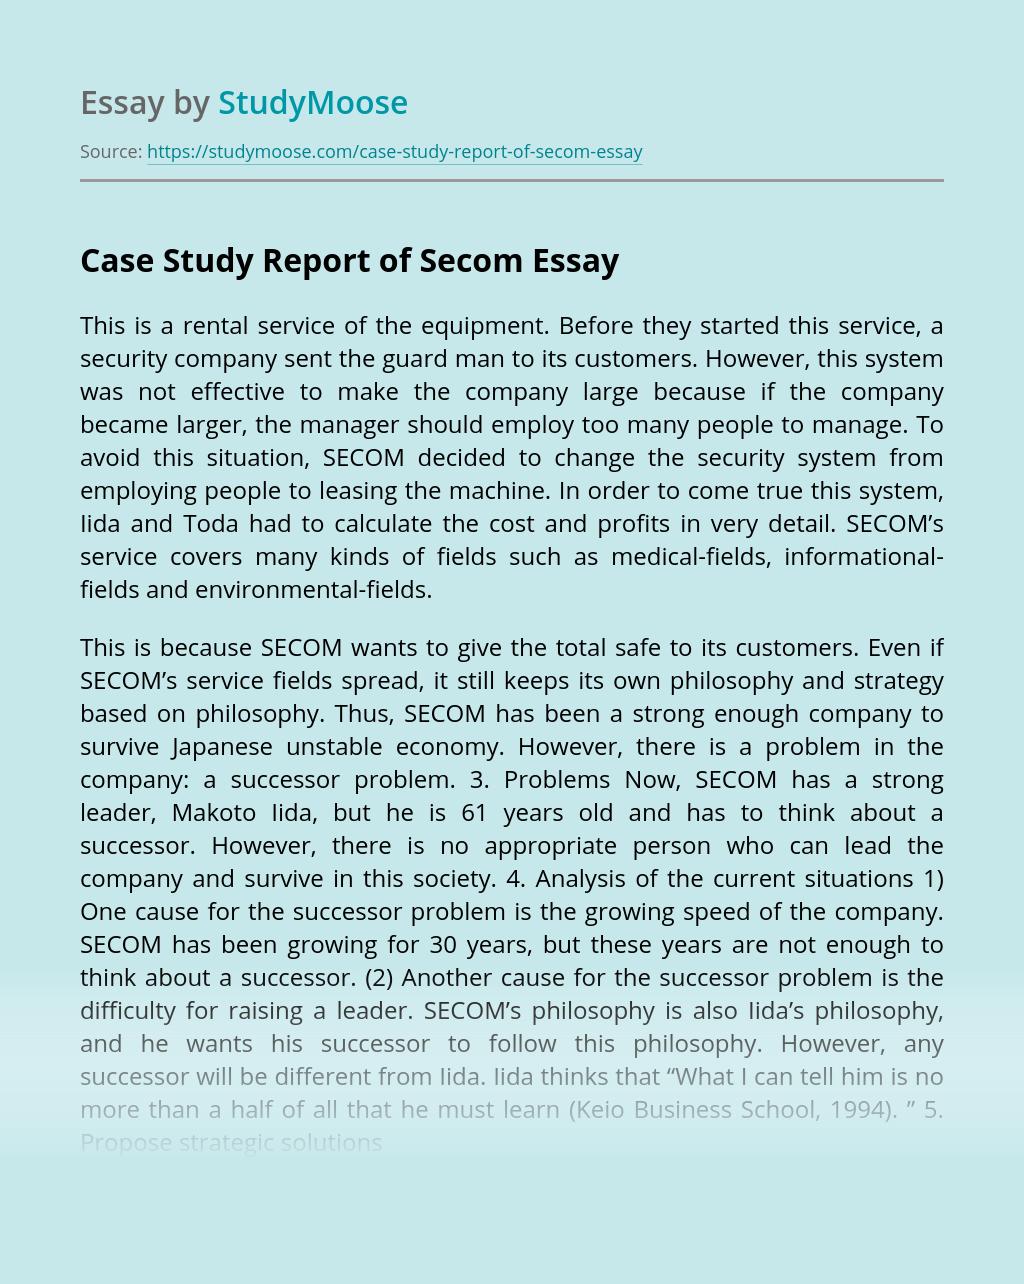 Case Study Report of Secom